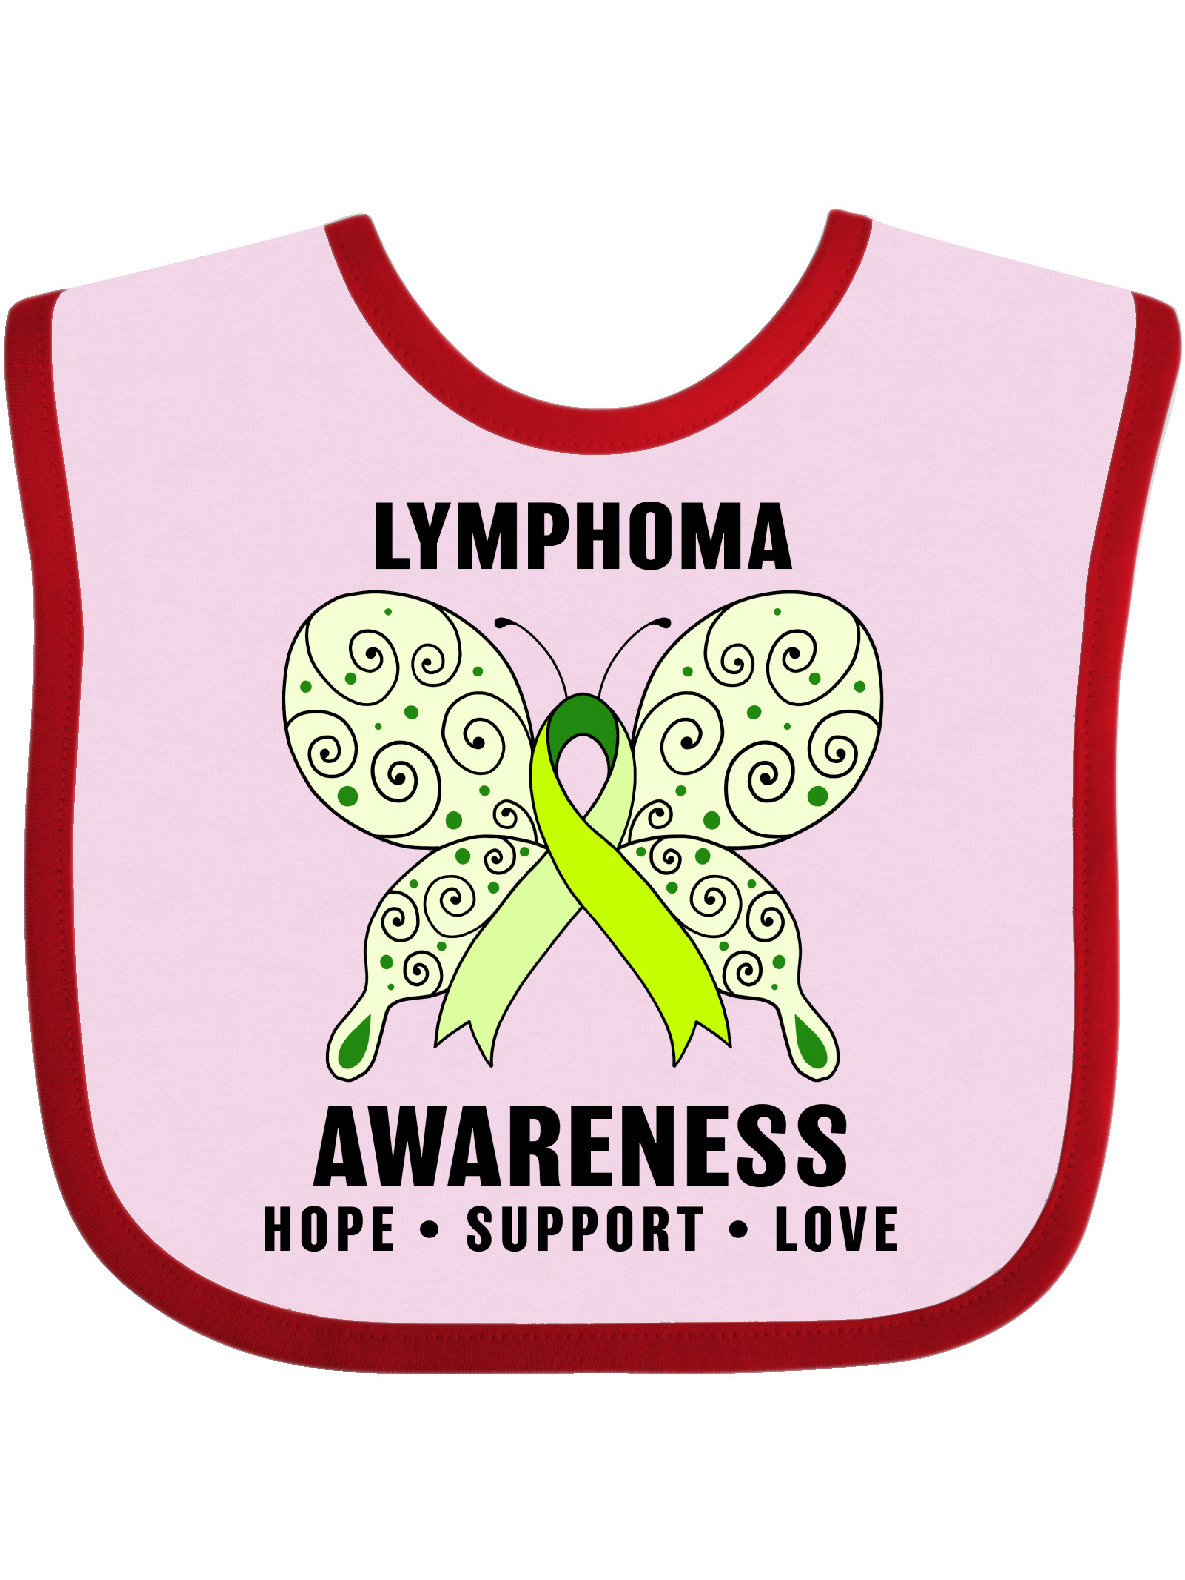 Lymphoma Awareness Hope Support and Love Baby Bib - Walmart.com - Walmart.com